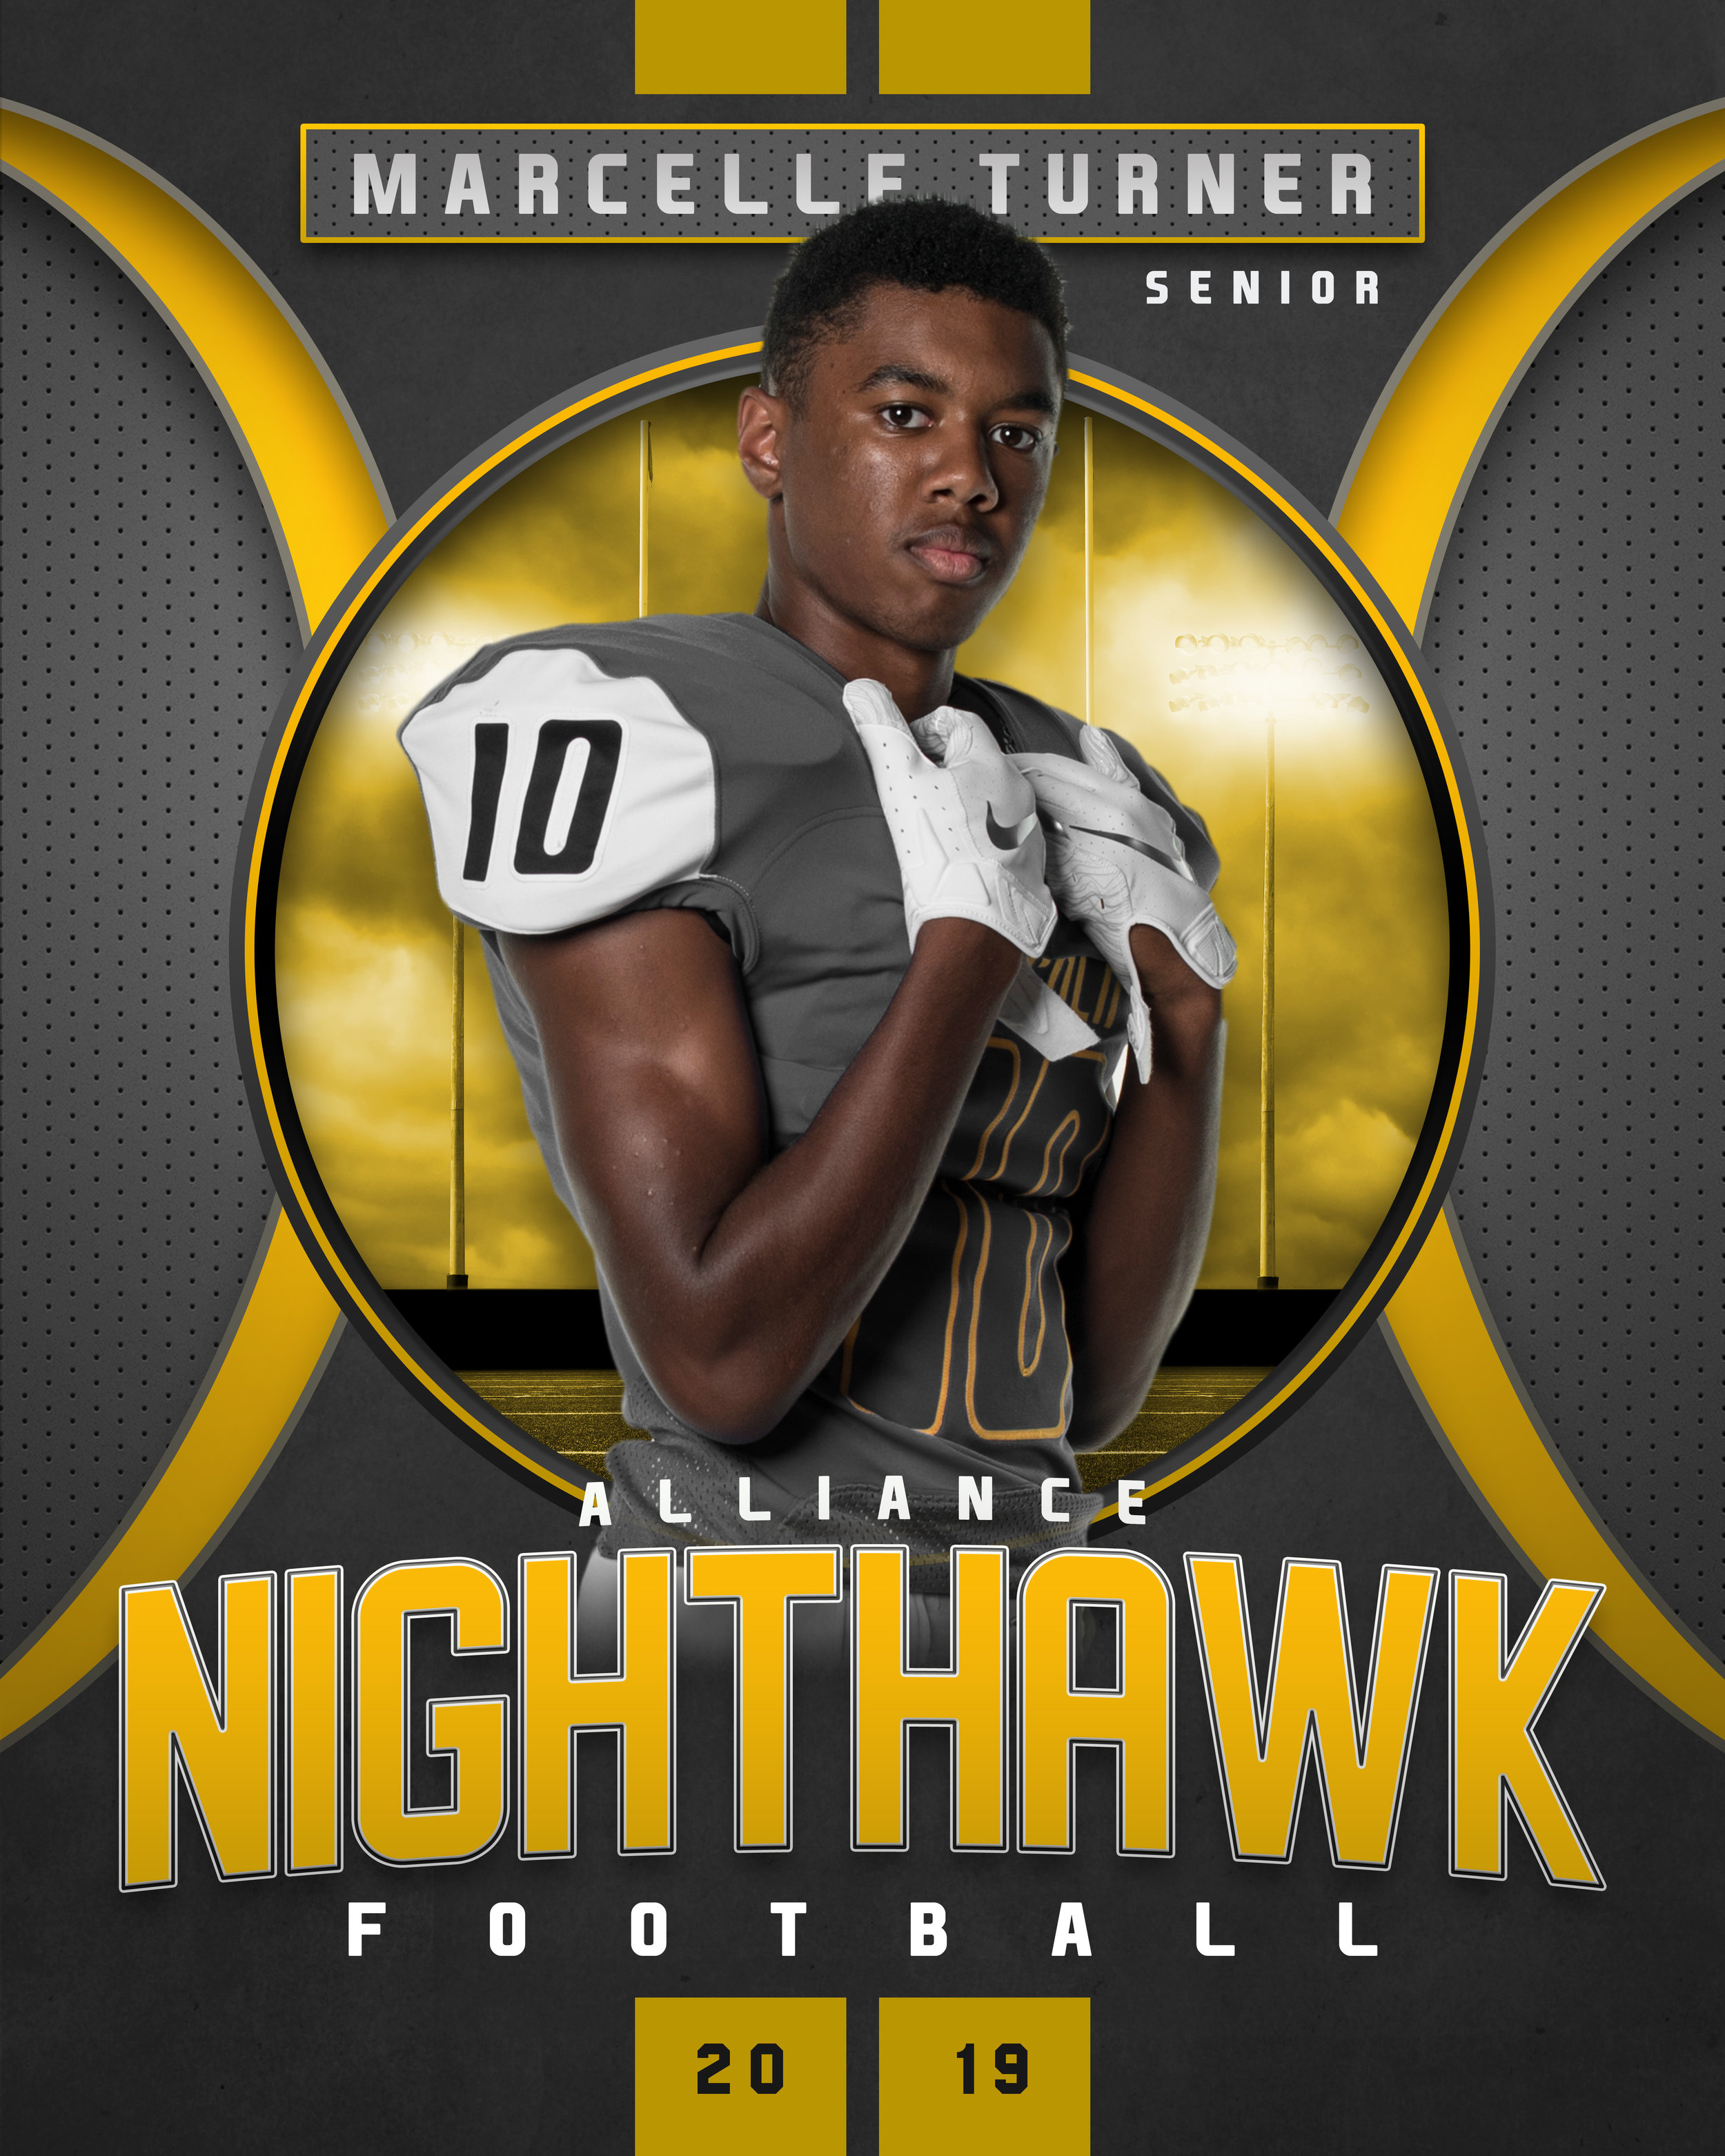 nighthawkfootball_2.jpg